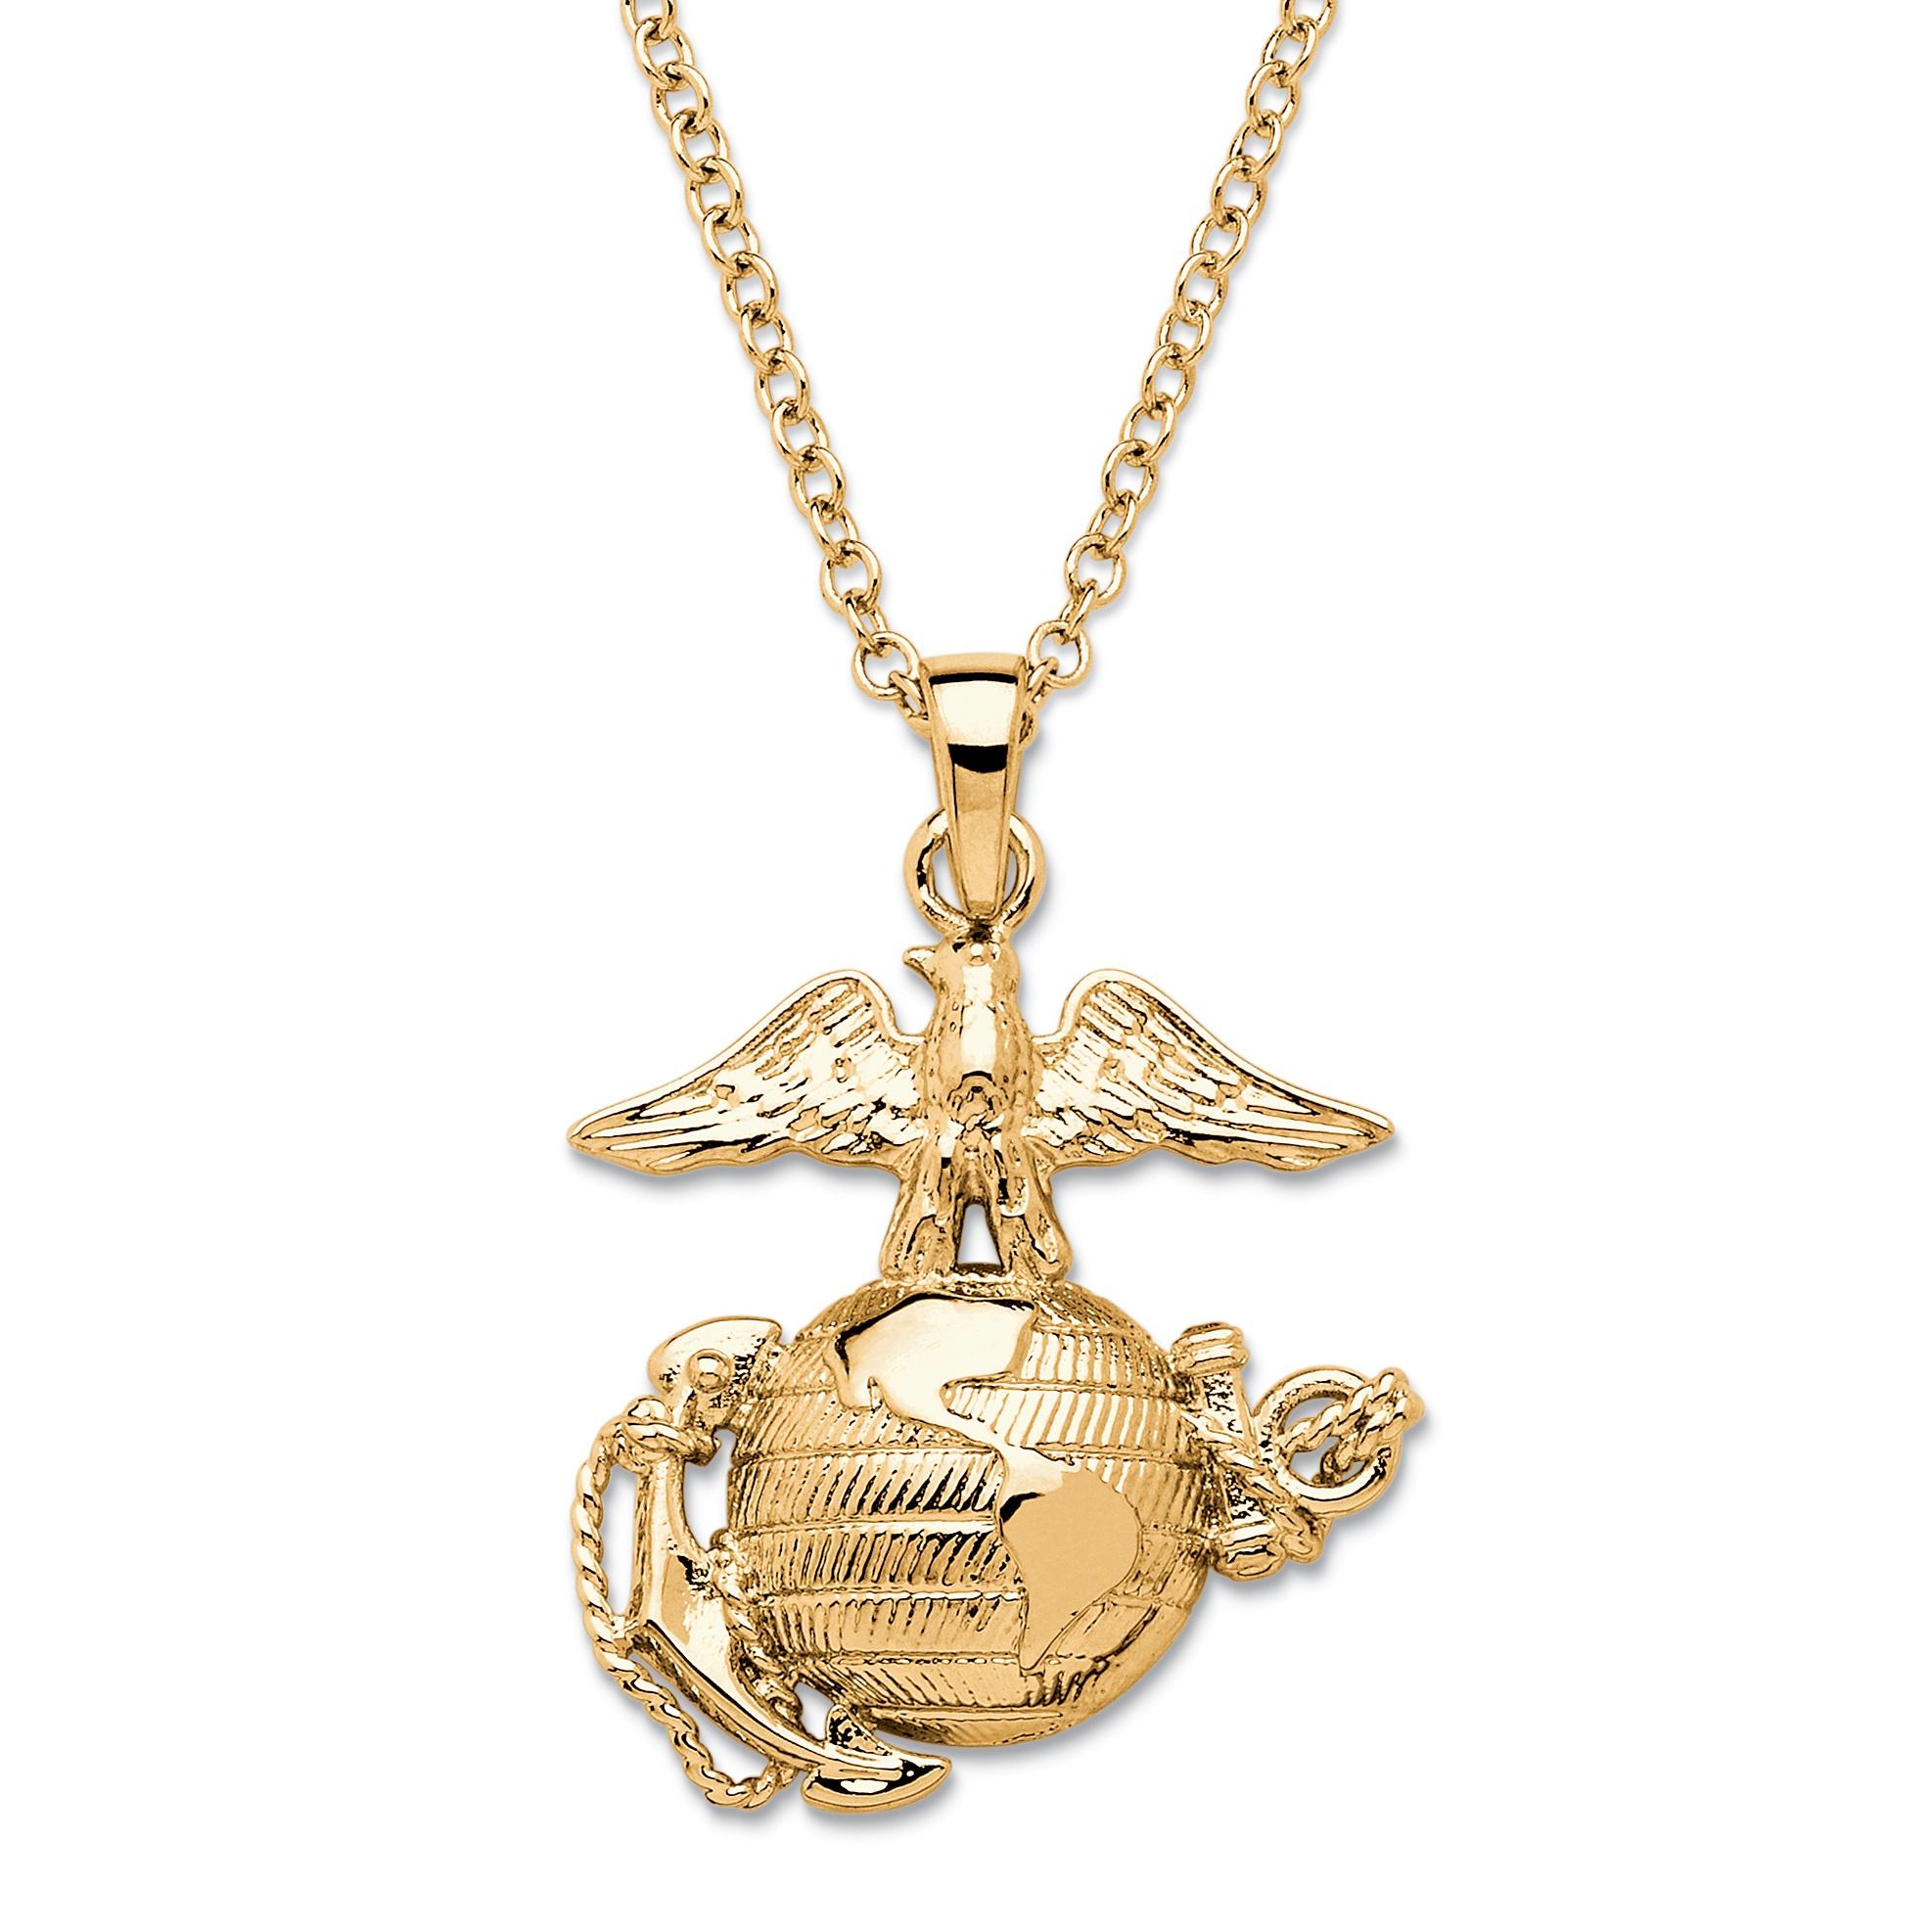 marine corps pendant necklace 14k gold plated 20 at. Black Bedroom Furniture Sets. Home Design Ideas